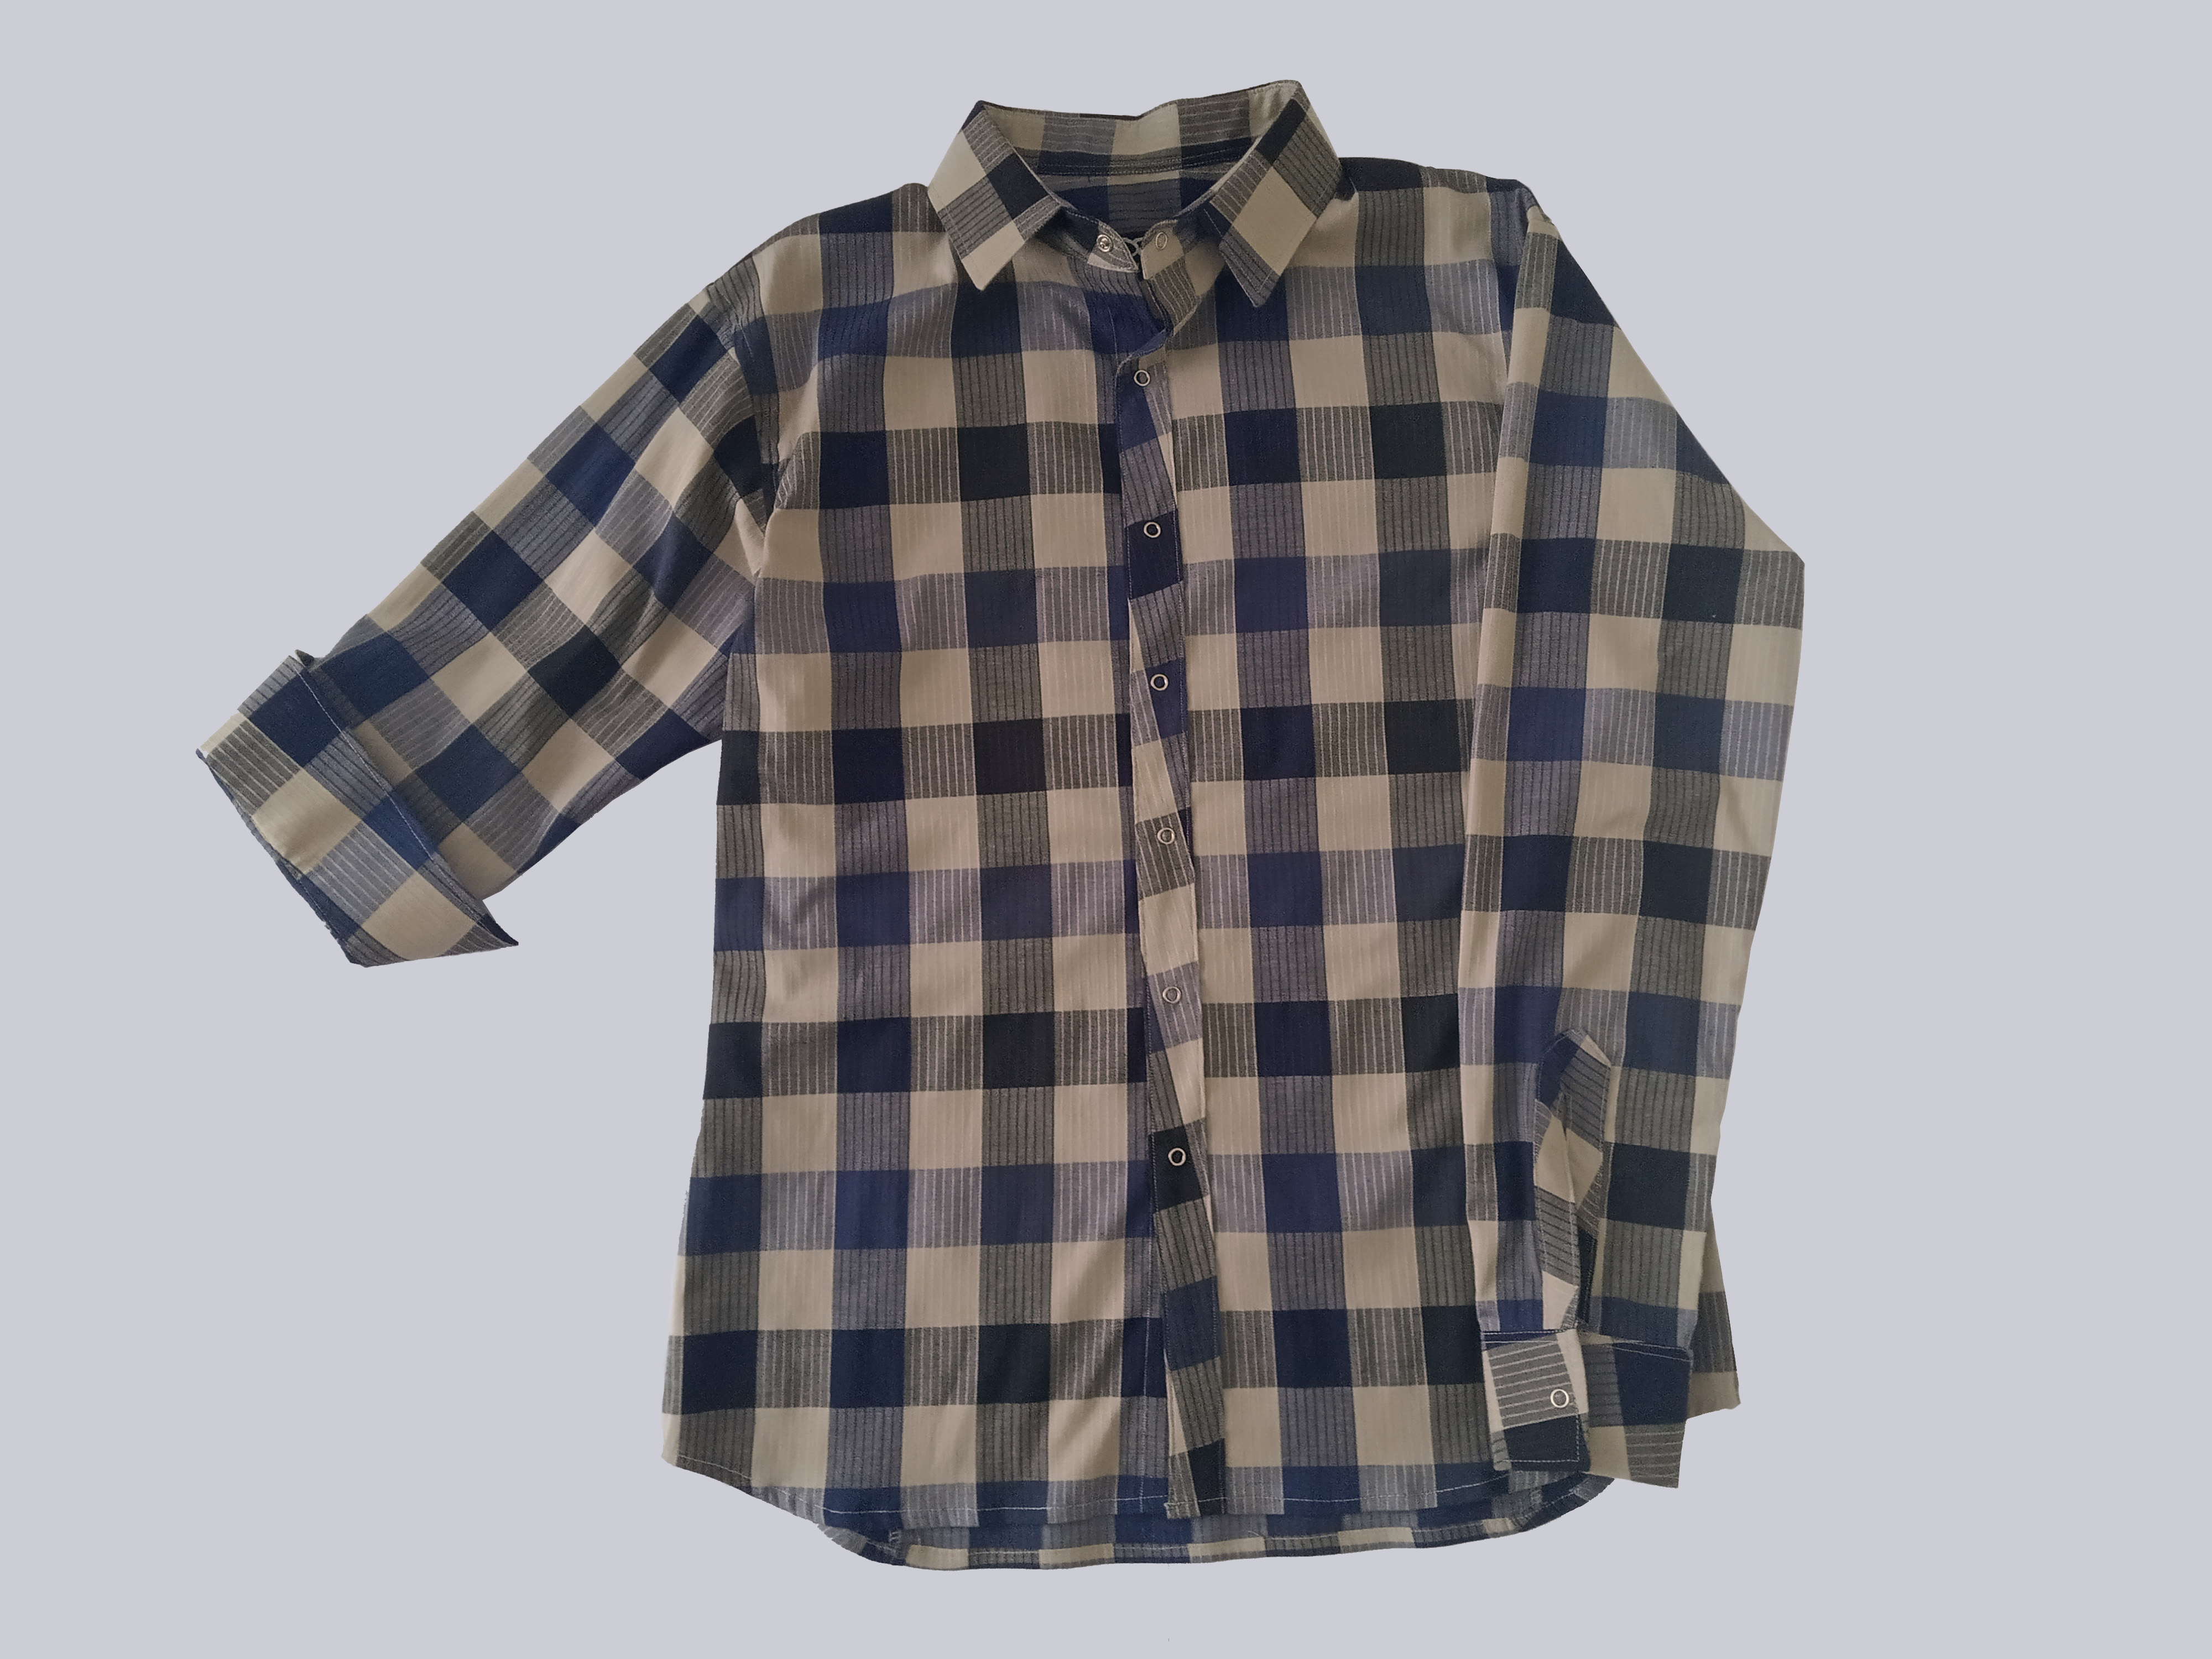 Beige check shirt